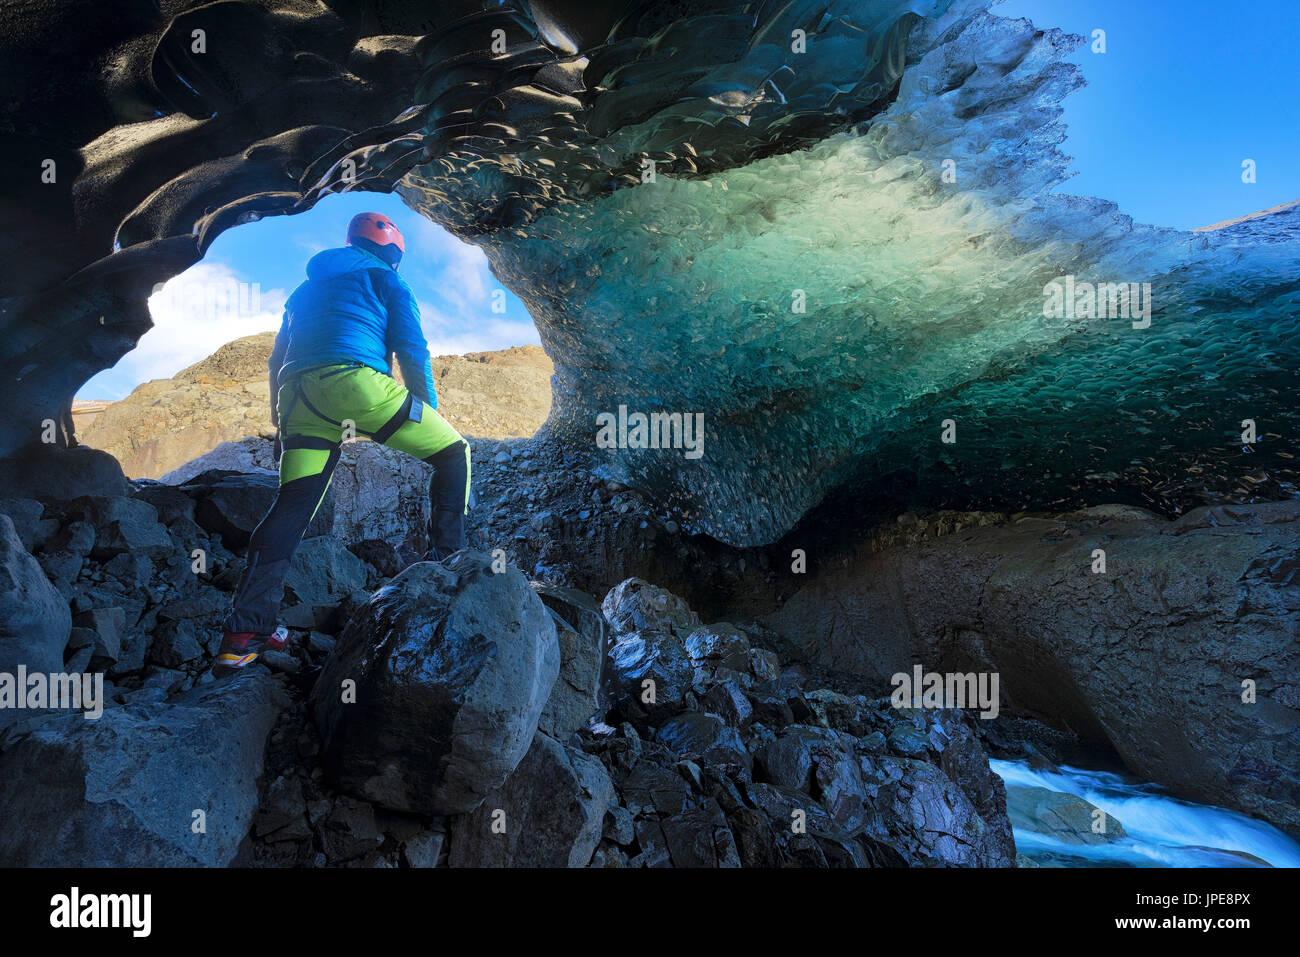 Skaftafell national park, Iceland, Europe. Man admire the blue crystal ice cave under the Vatnajokull glacier in winter. - Stock Image